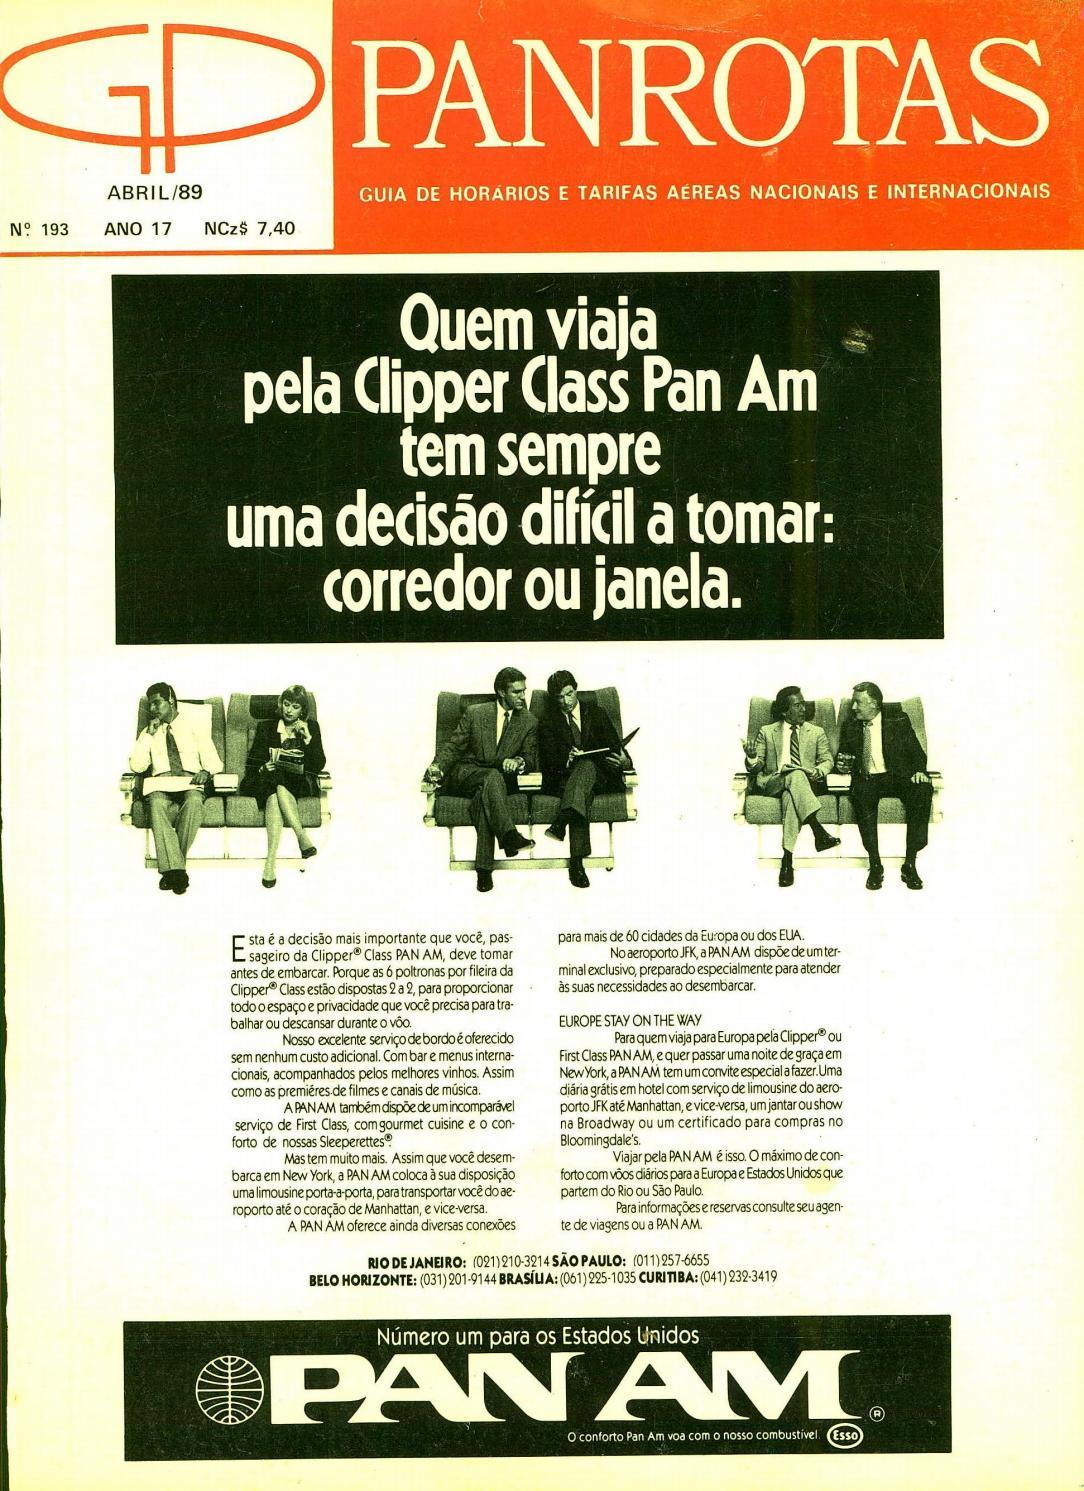 a30b23479d5 Guia PANROTAS - Edição 193 - Abril 1989 by PANROTAS Editora - issuu